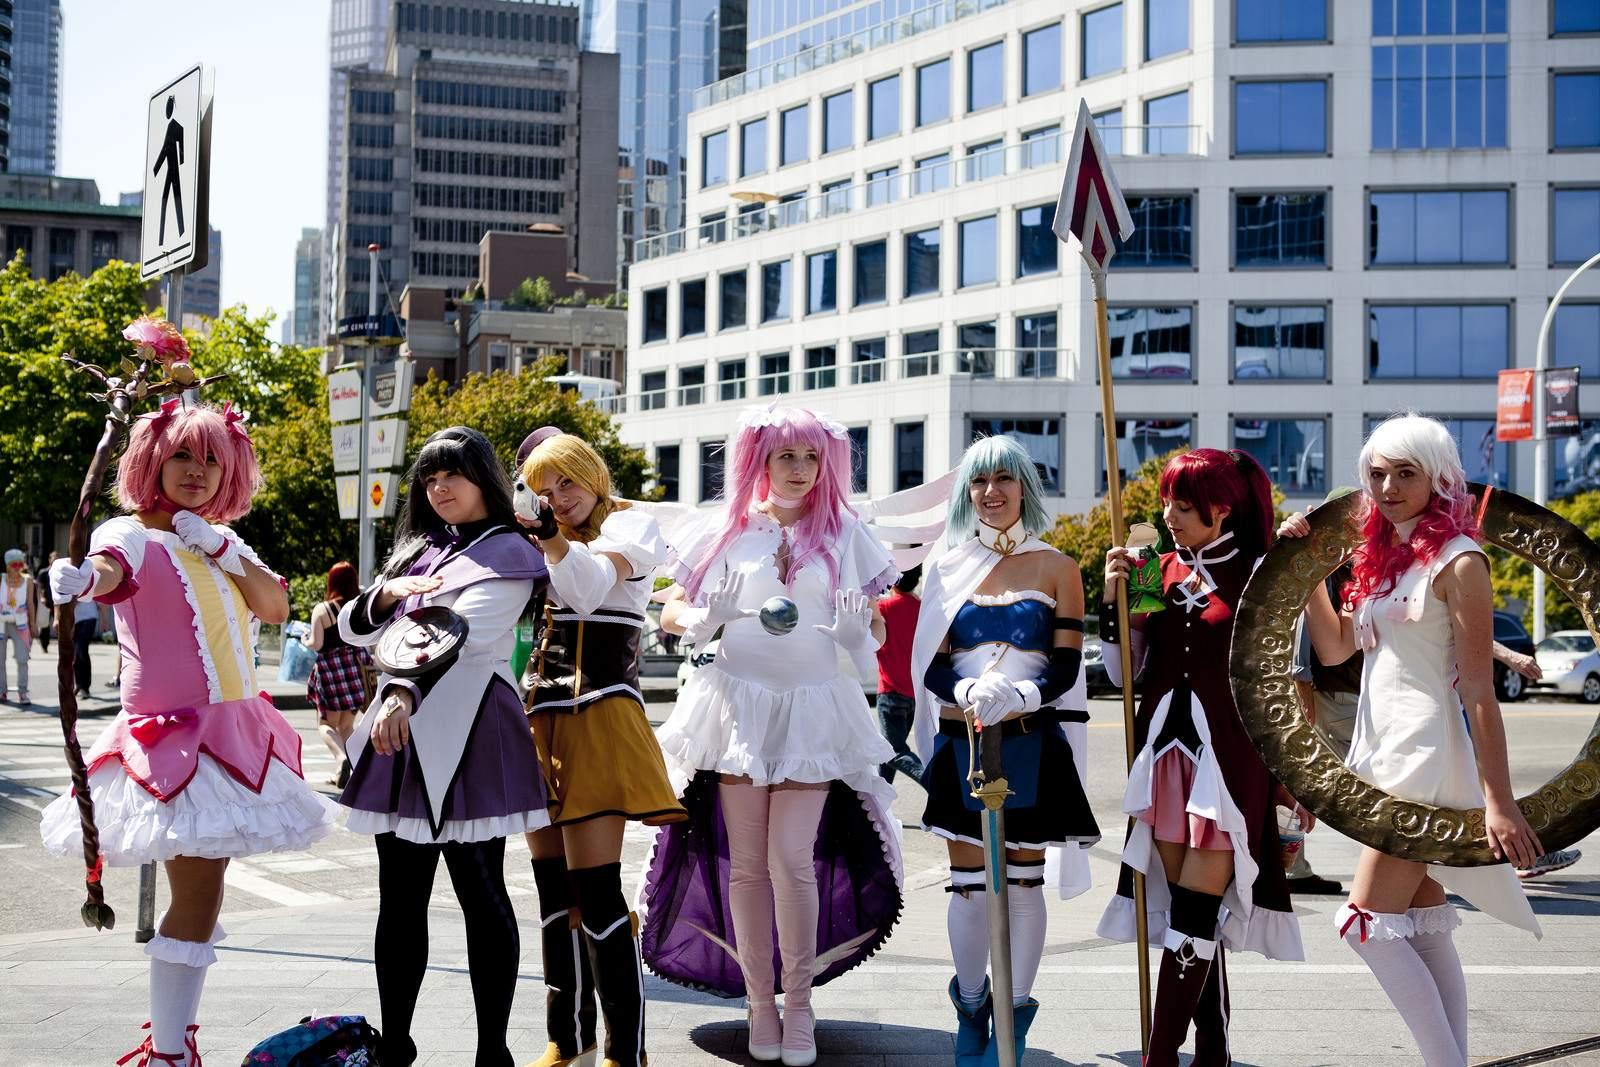 anime6 Anime Revolution 2014, Canada